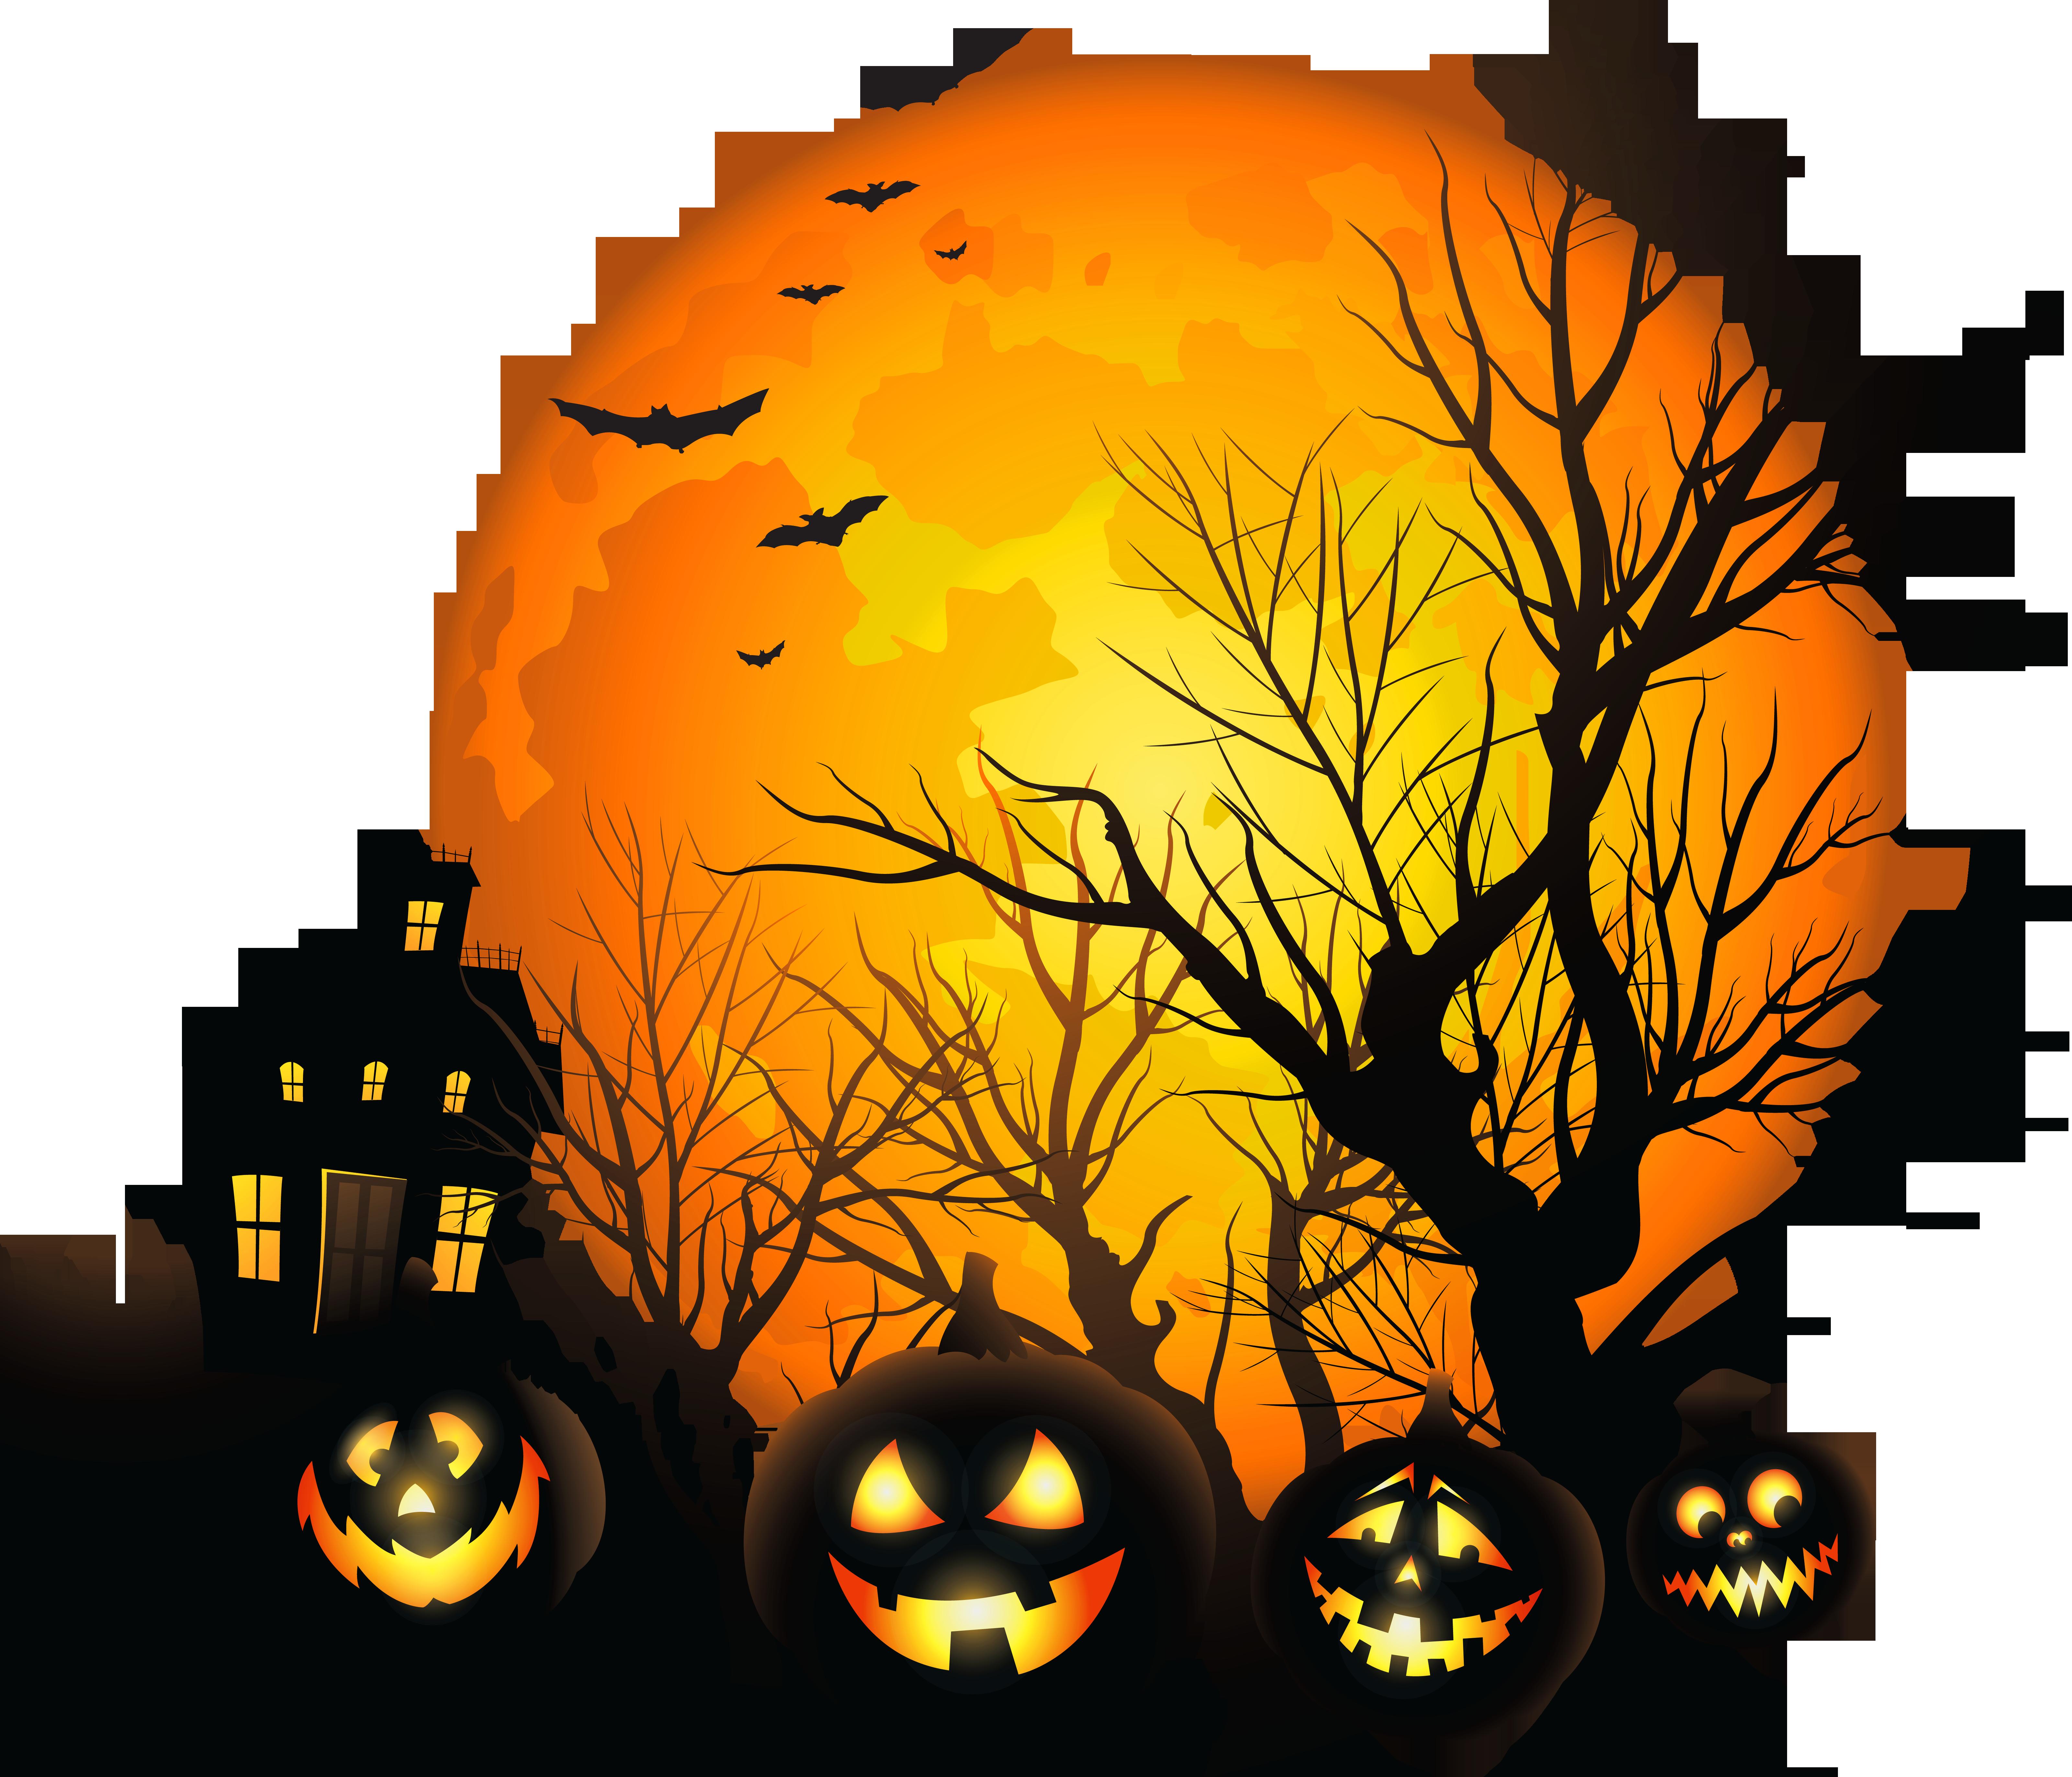 Haunted clipart moon #12